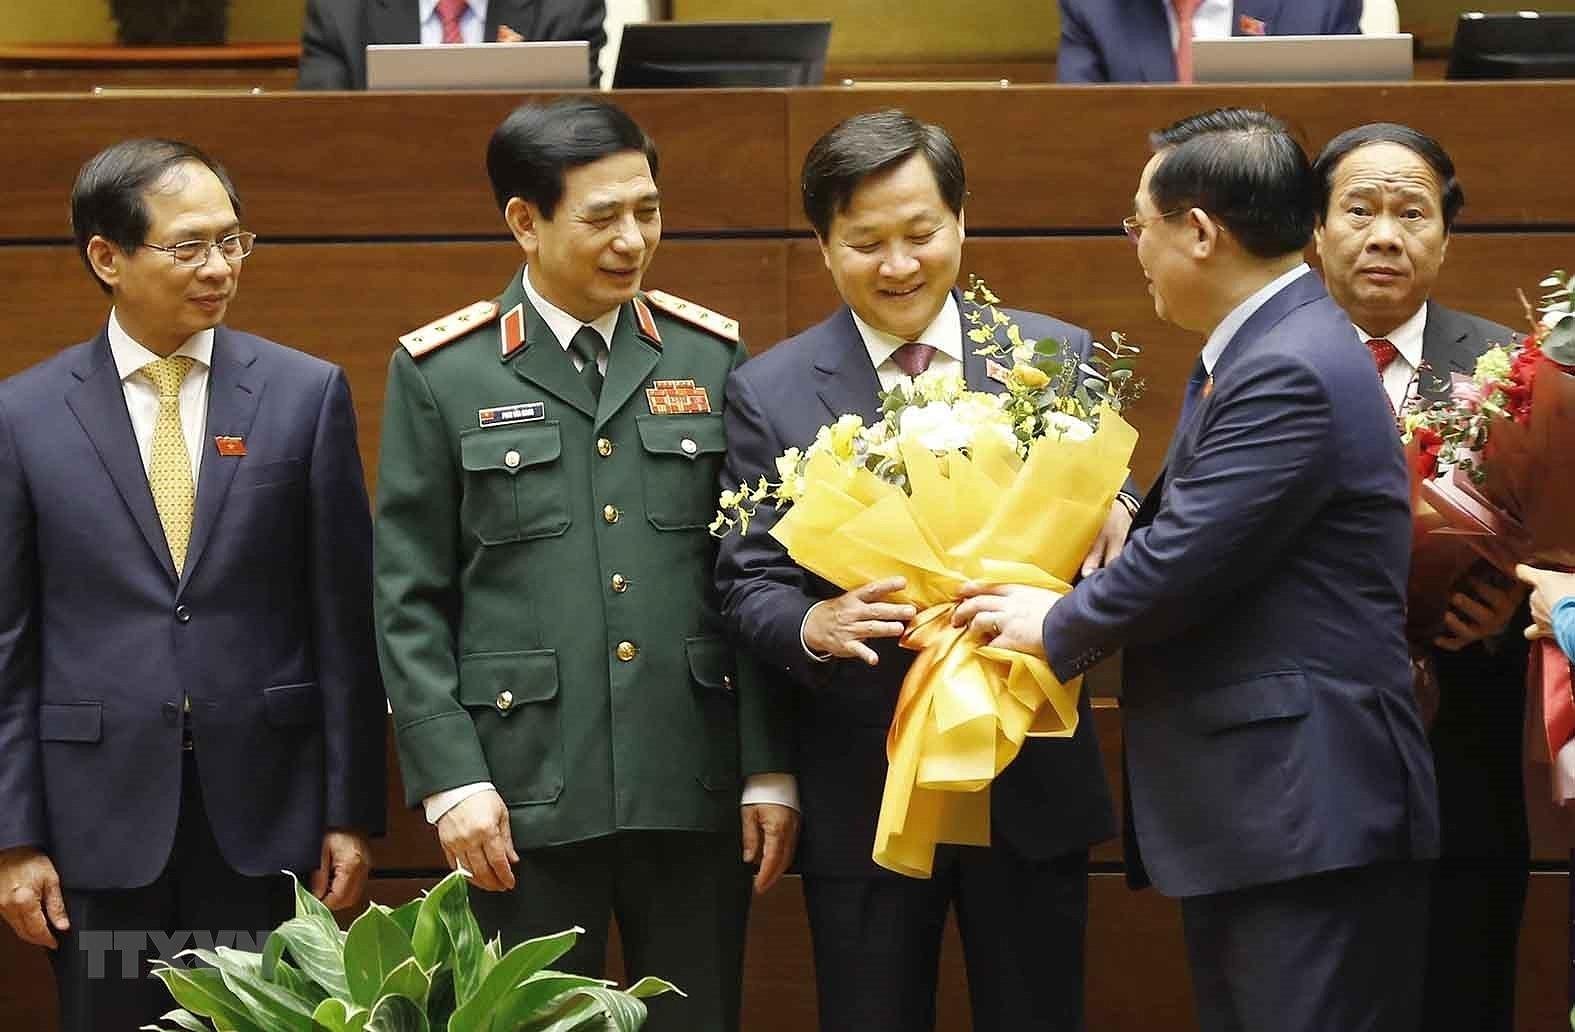 Quoc hoi phe chuan de nghi bo nhiem mot so Pho Thu tuong, Bo truong hinh anh 16